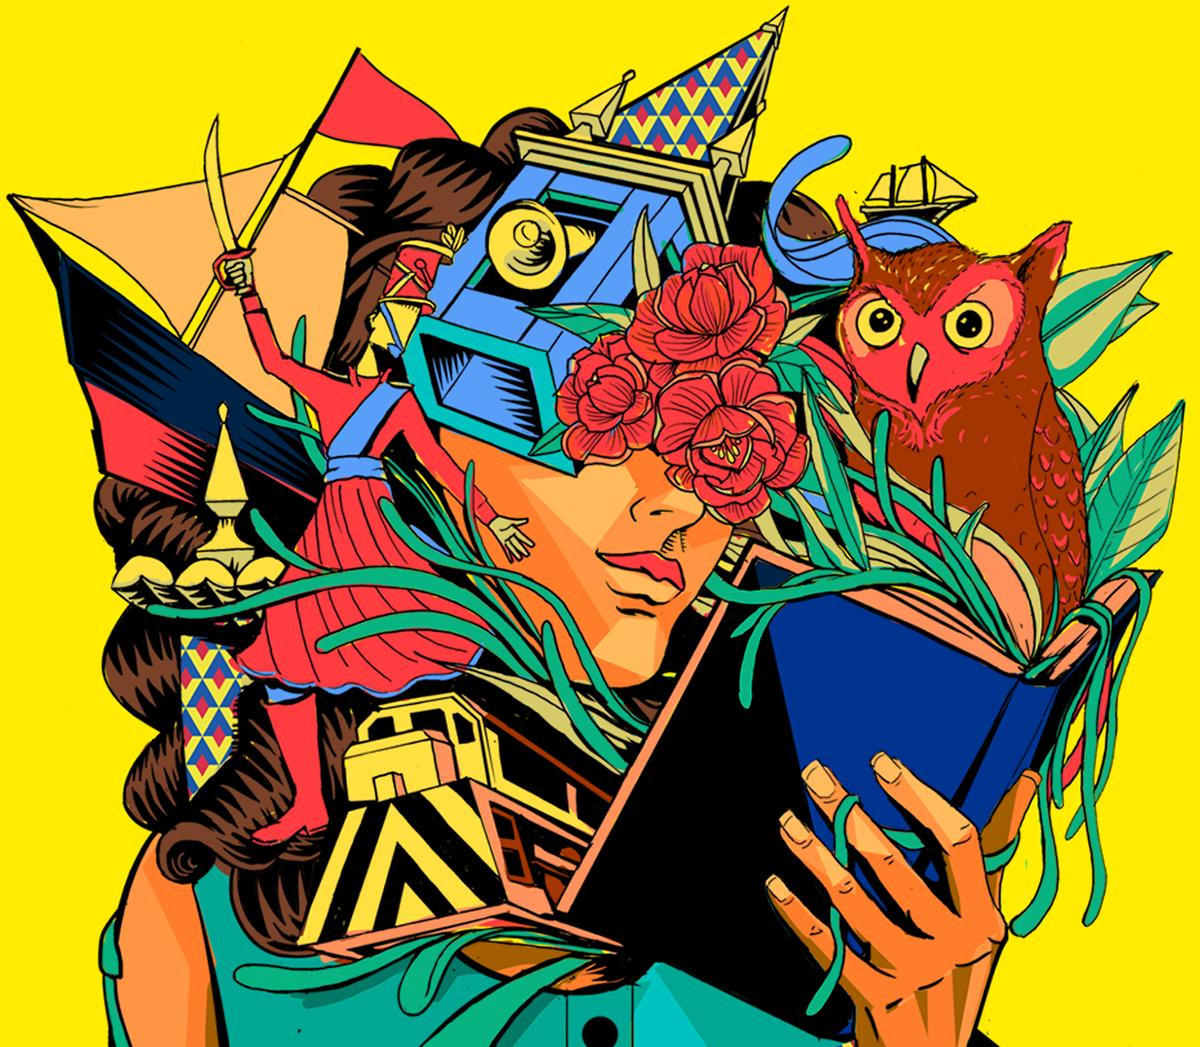 bahia cachoeira festival flica identidade visual jout jout literatura